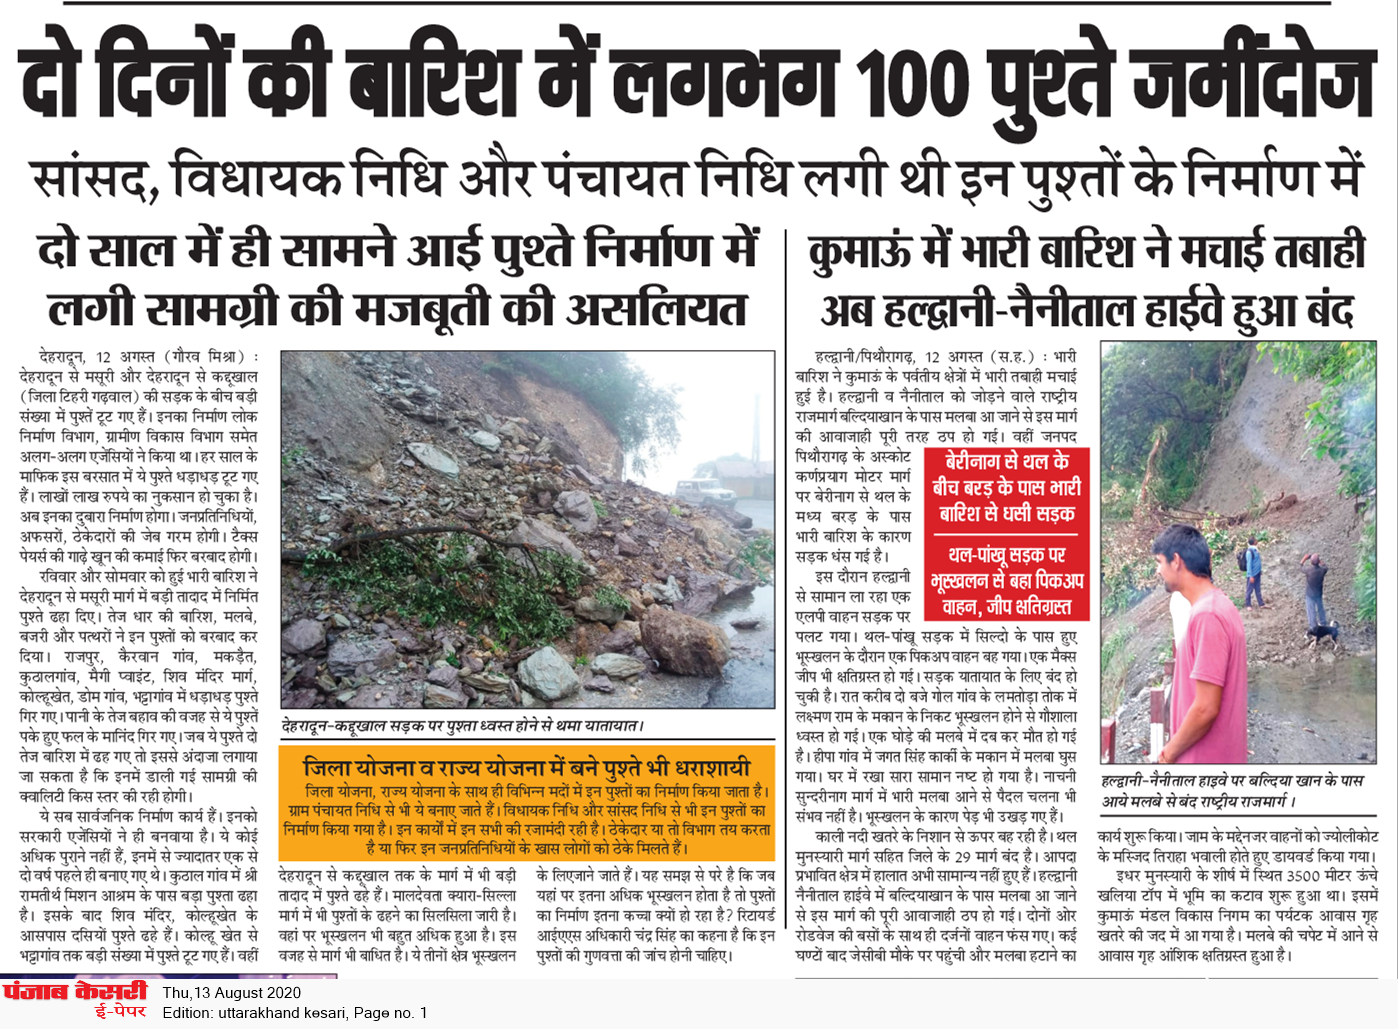 Uttarakhand Kesari 8/13/2020 12:00:00 AM